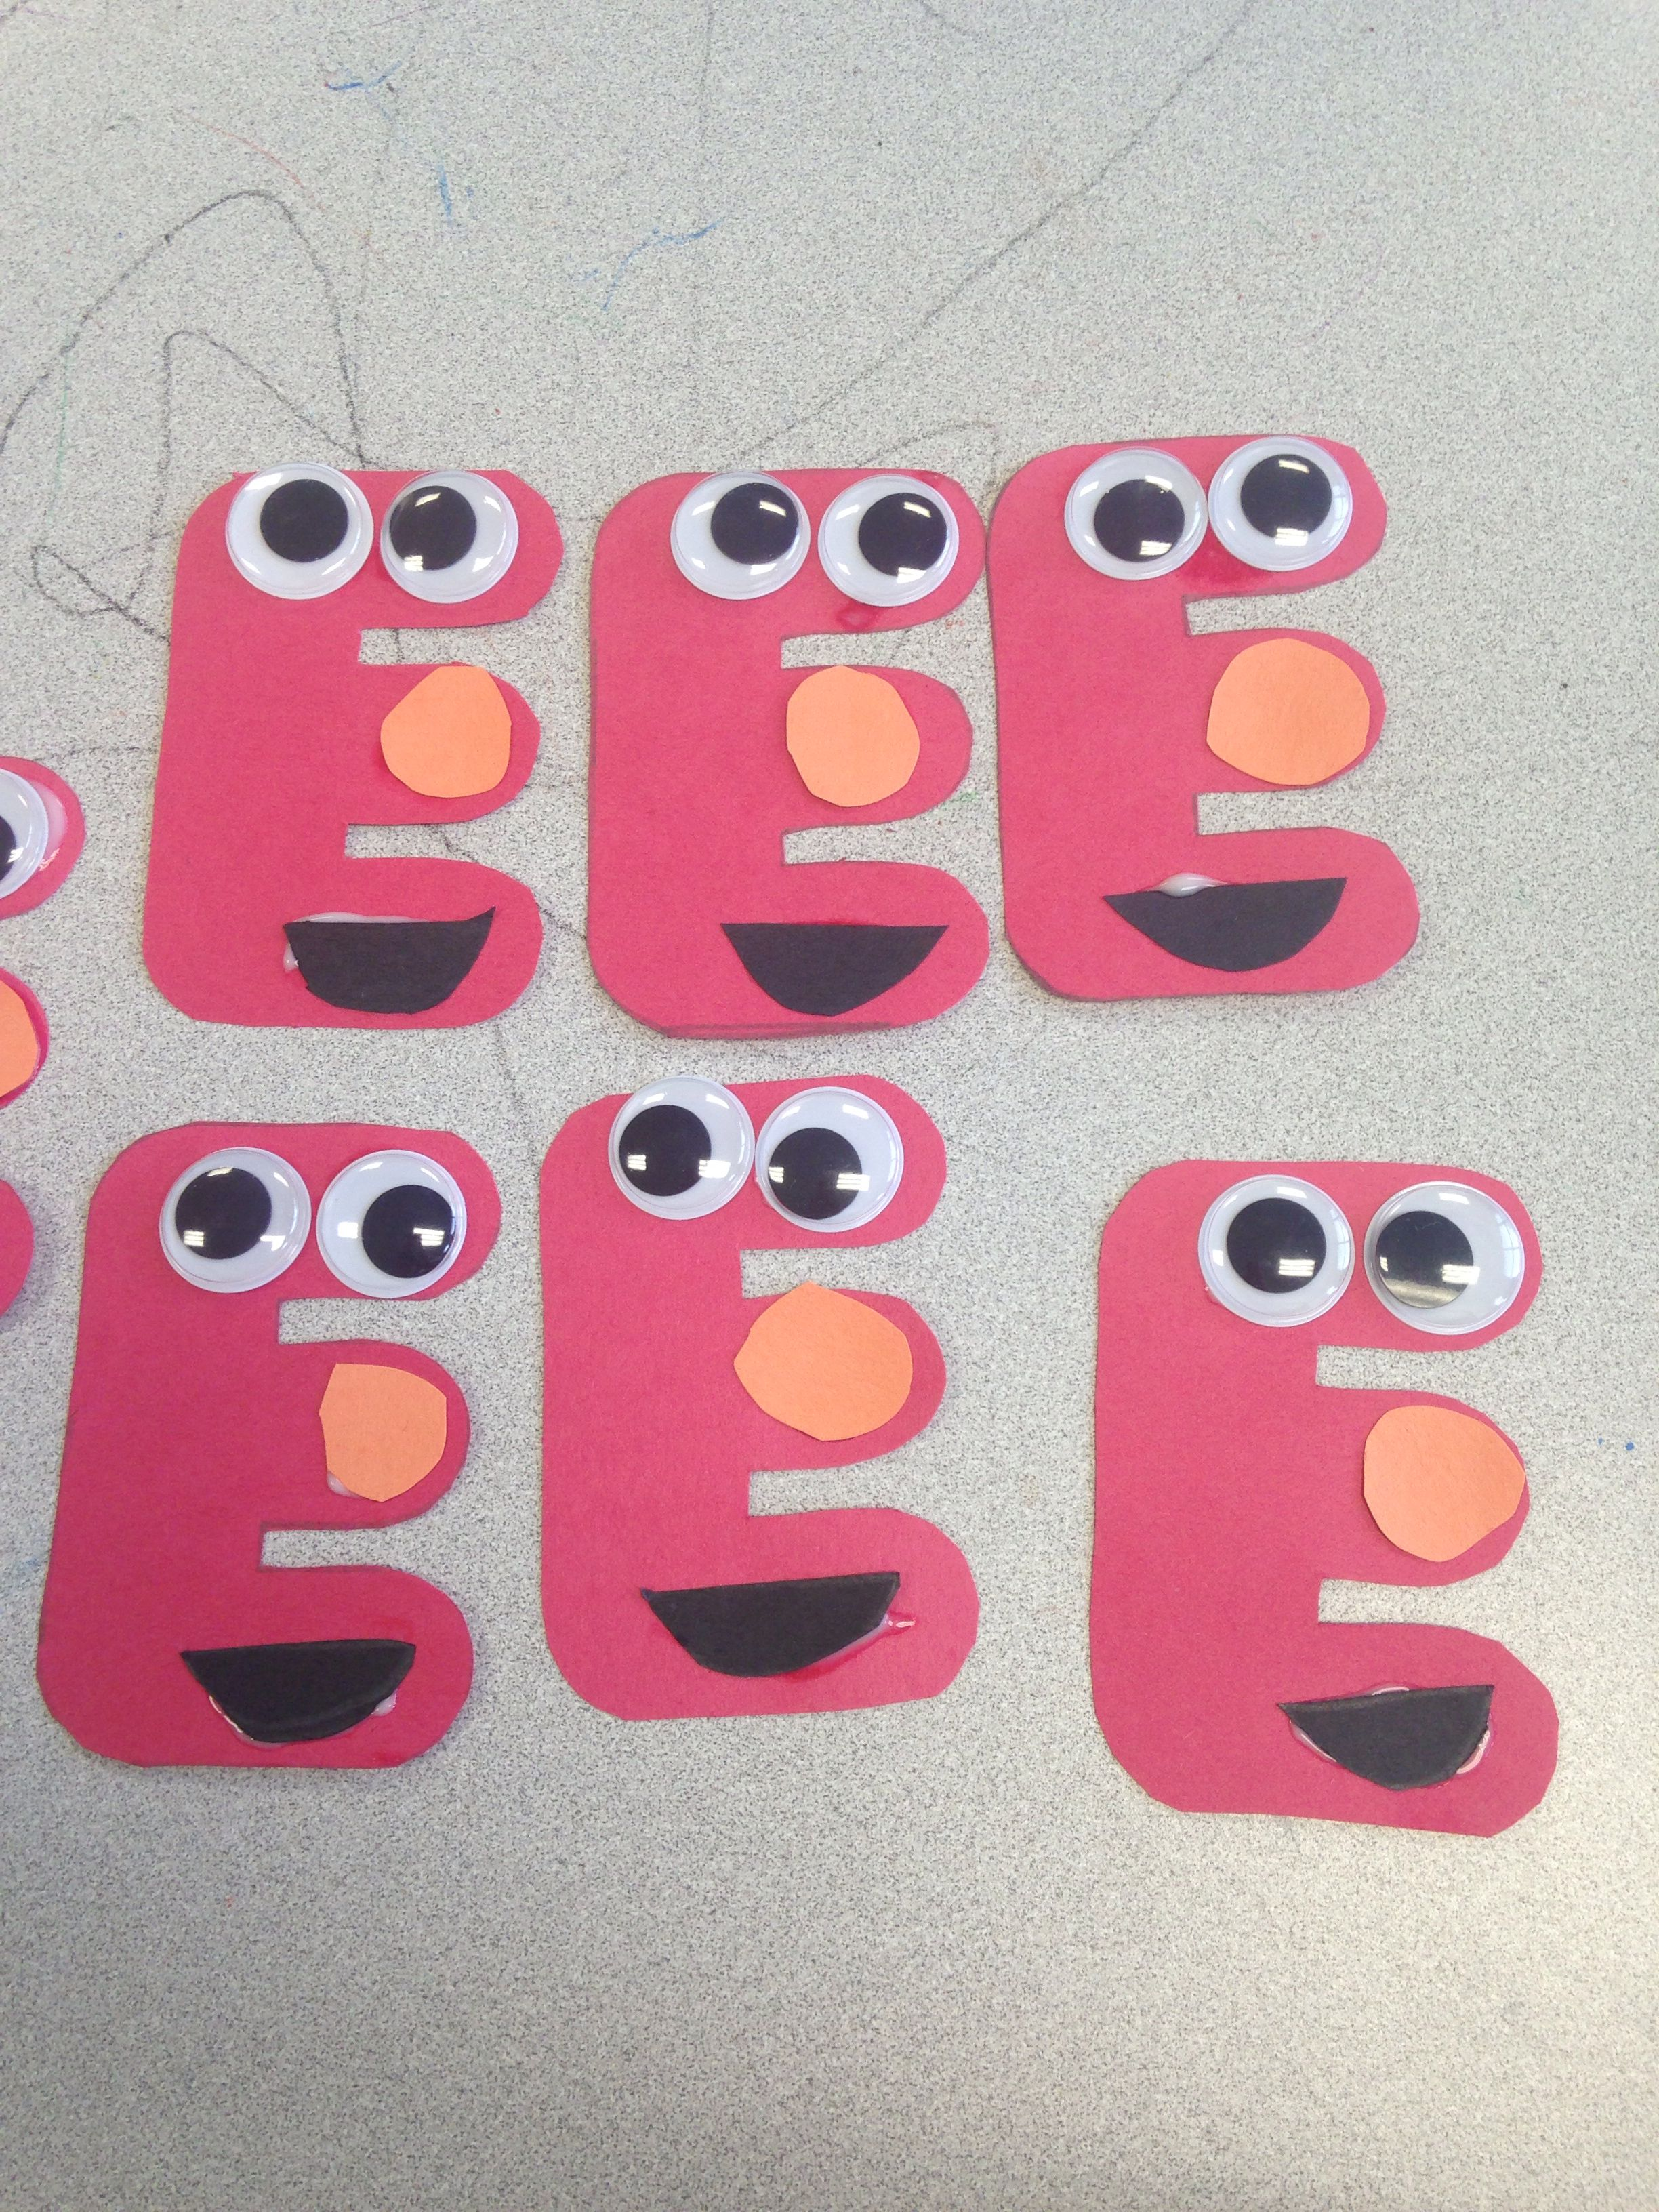 Broken Link But So Cute E Is For Elmo Easy Preschool